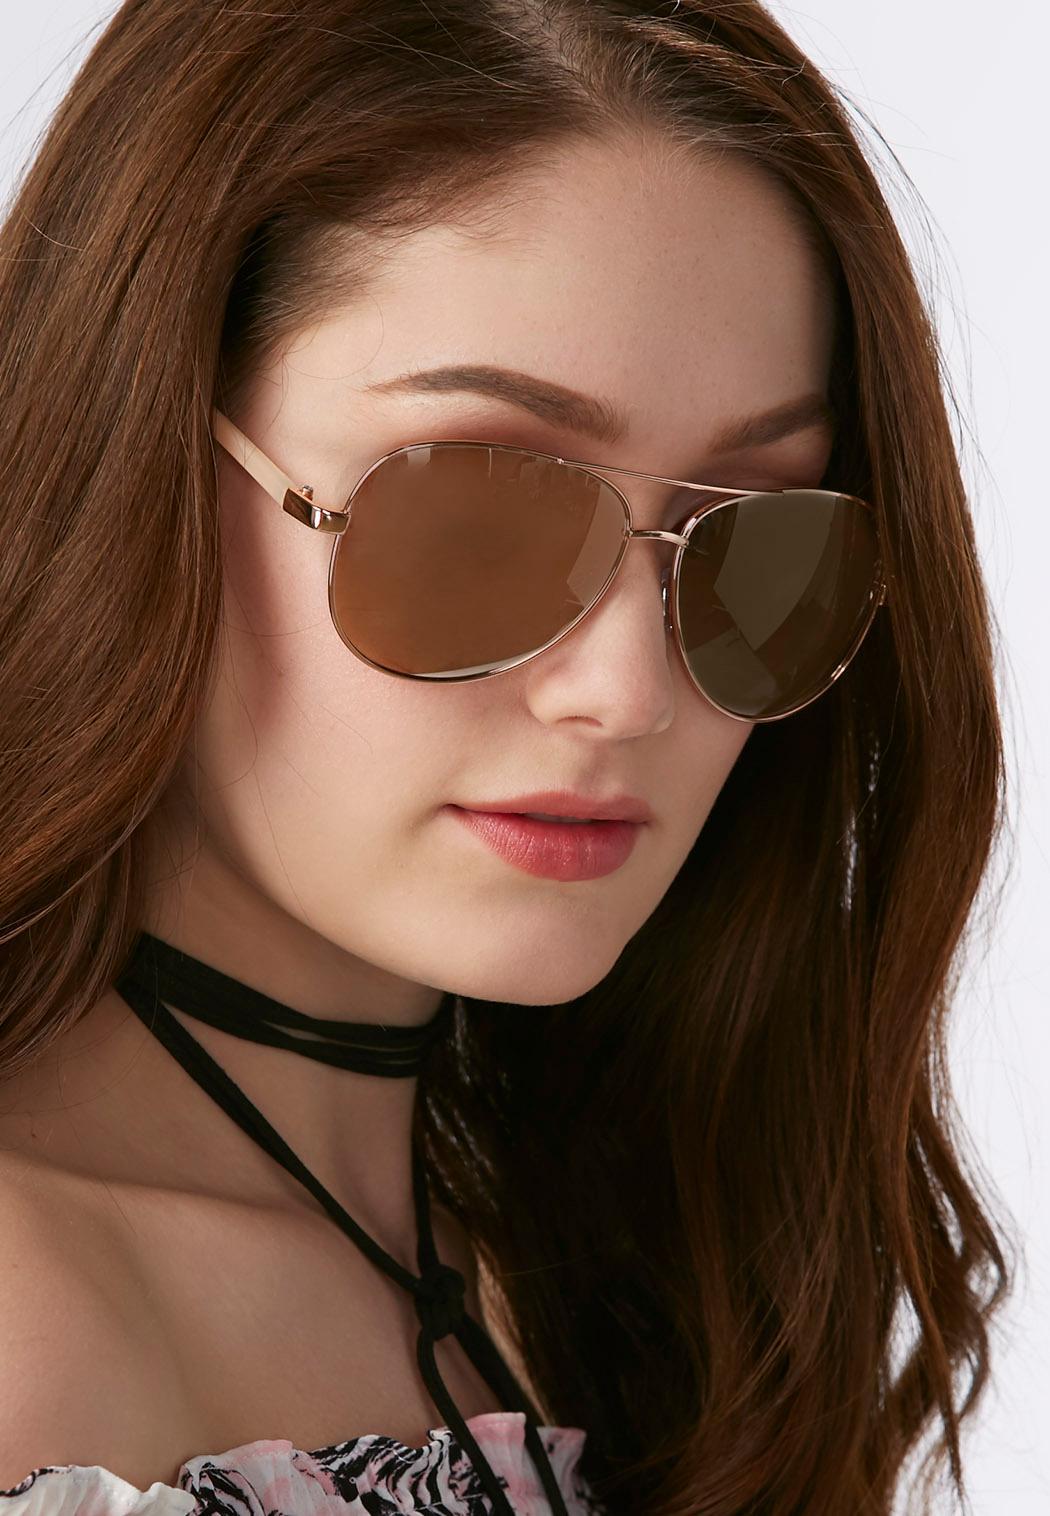 Rose Tinted Aviator Sunglasses (Item #33927120)